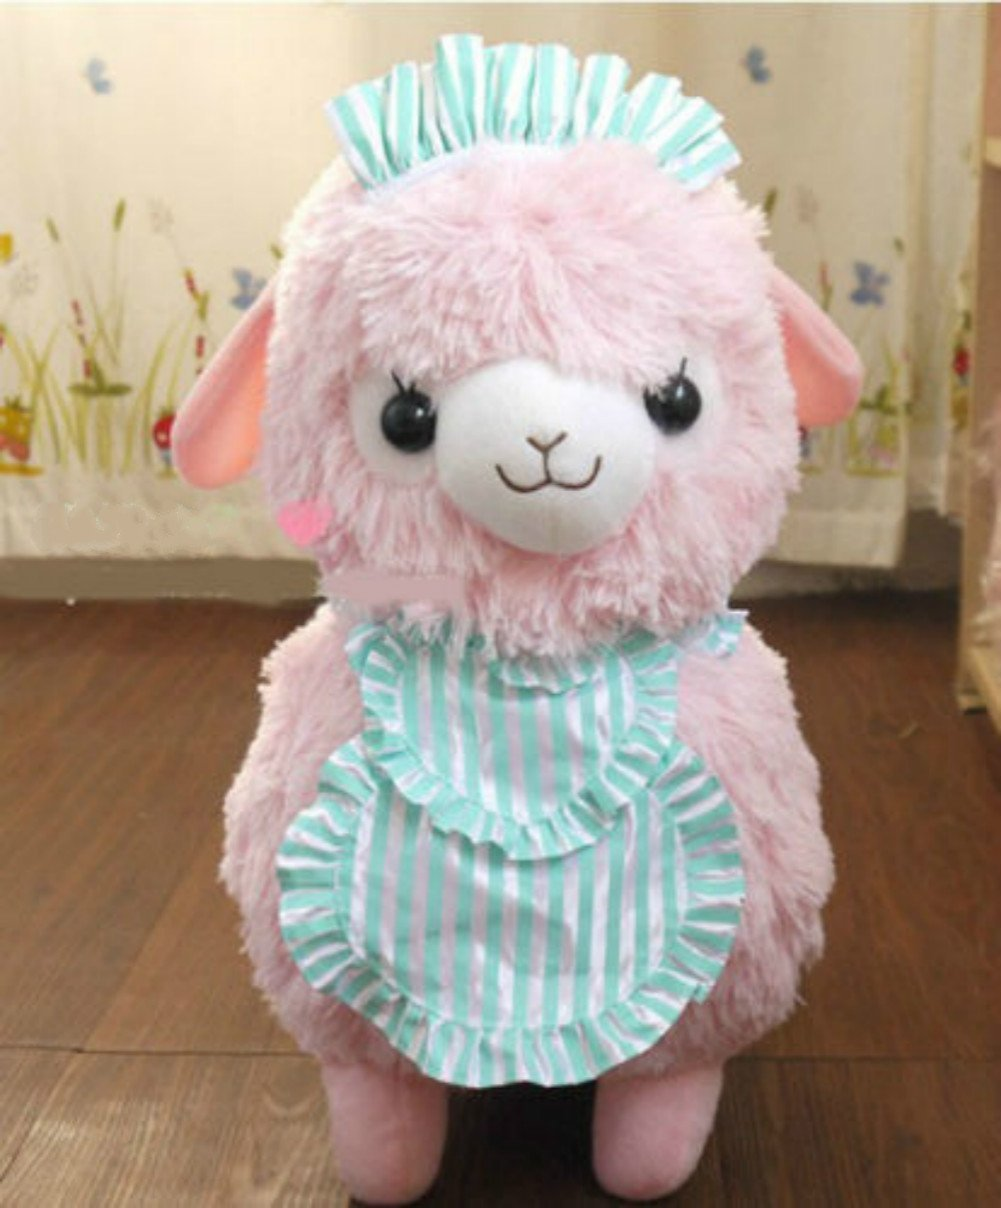 Amazon.com: New Pink 45cm Arpakasso Alpacasso Alpaca Plush Toy Cafe Waiters and Maids: Toys & Games